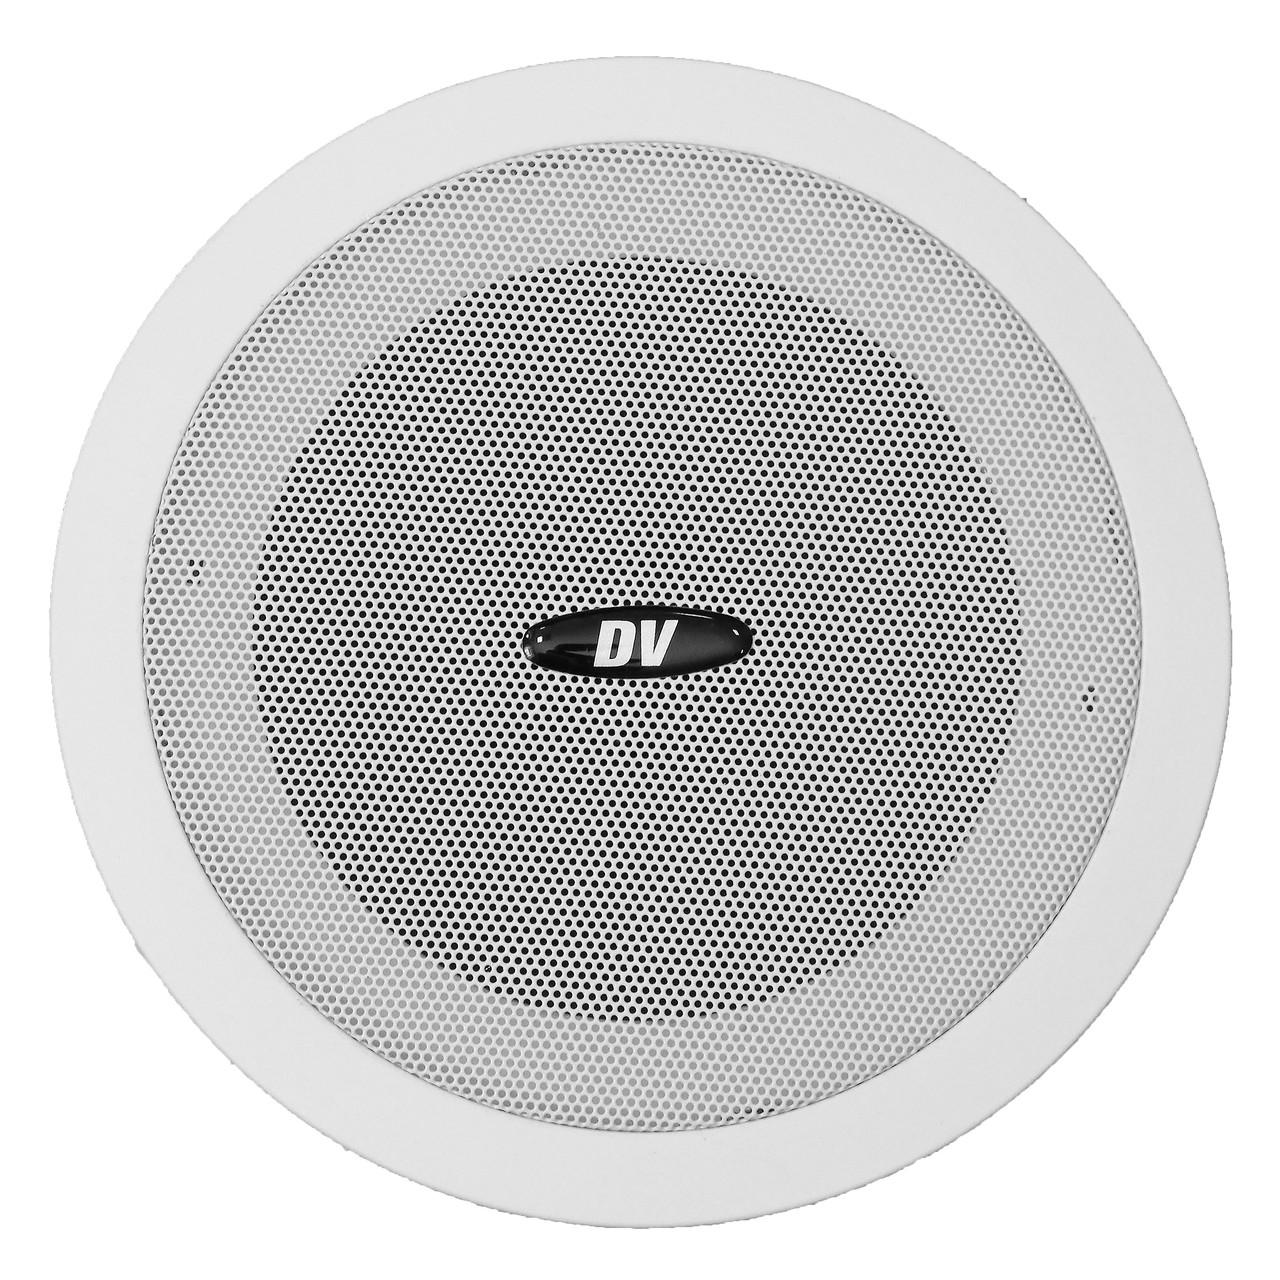 Потолочная АС DV audio WS-501, Динамик для фонового звука